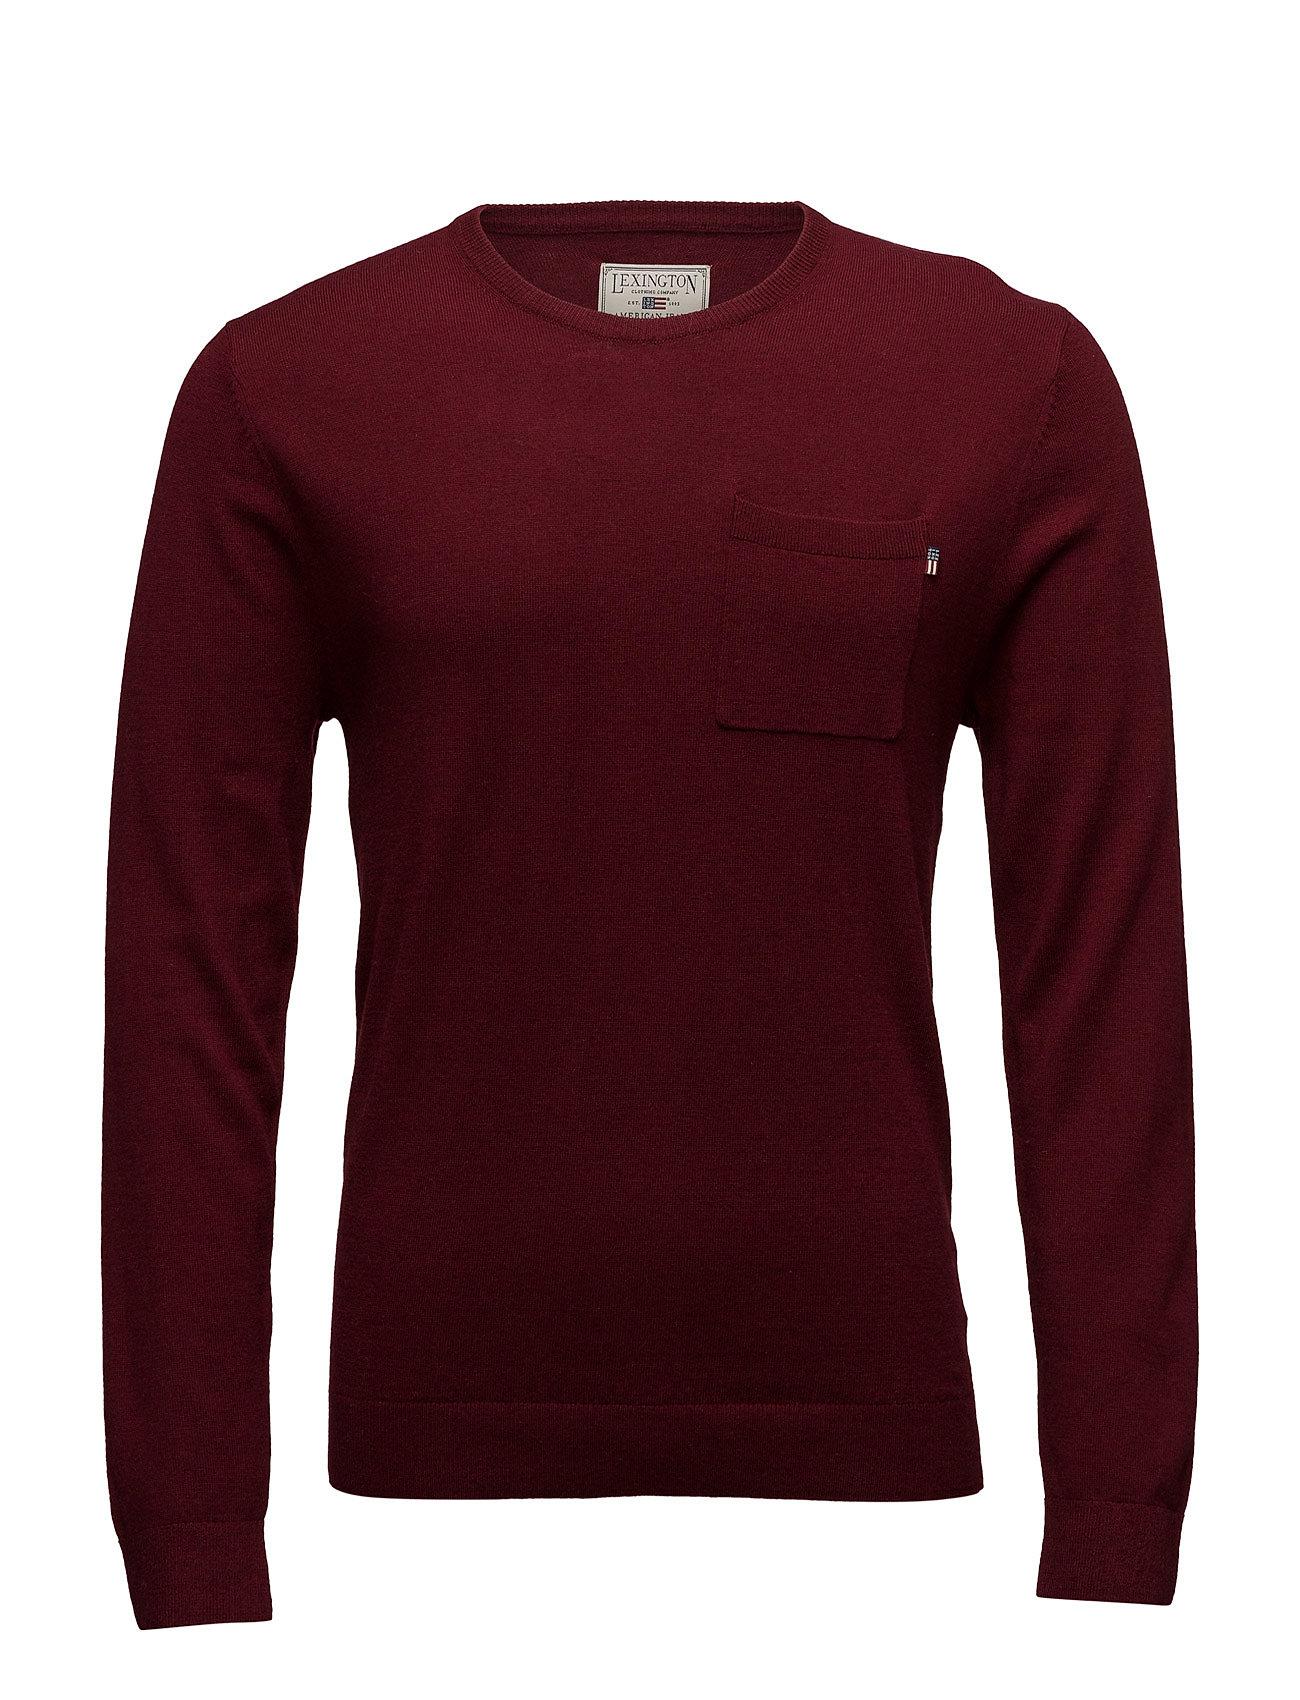 Jeff Crew Neck Sweater Lexington Company Striktøj til Mænd i